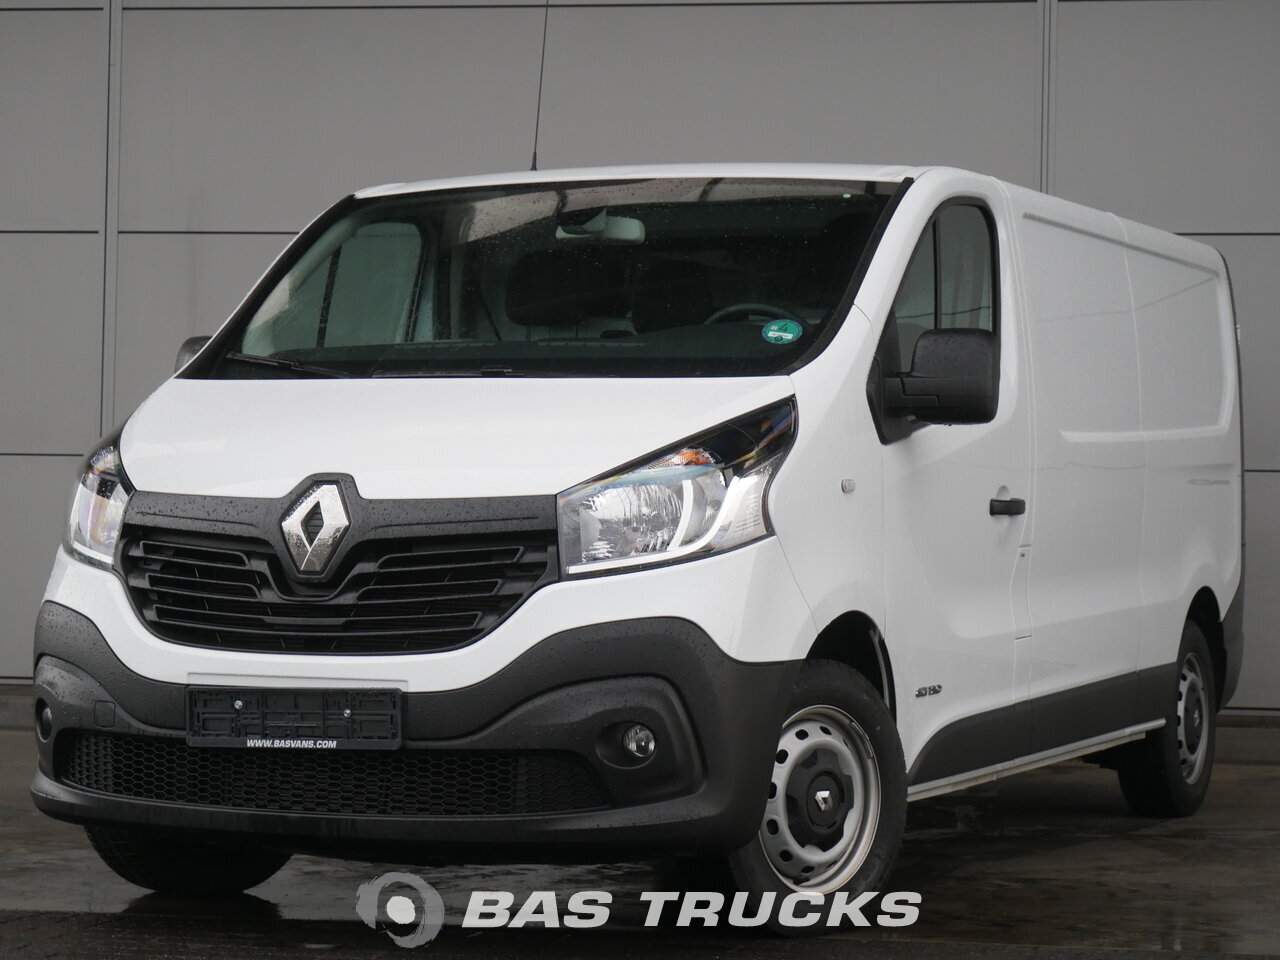 For sale at BAS Vans: Renault Trafic 05/2017